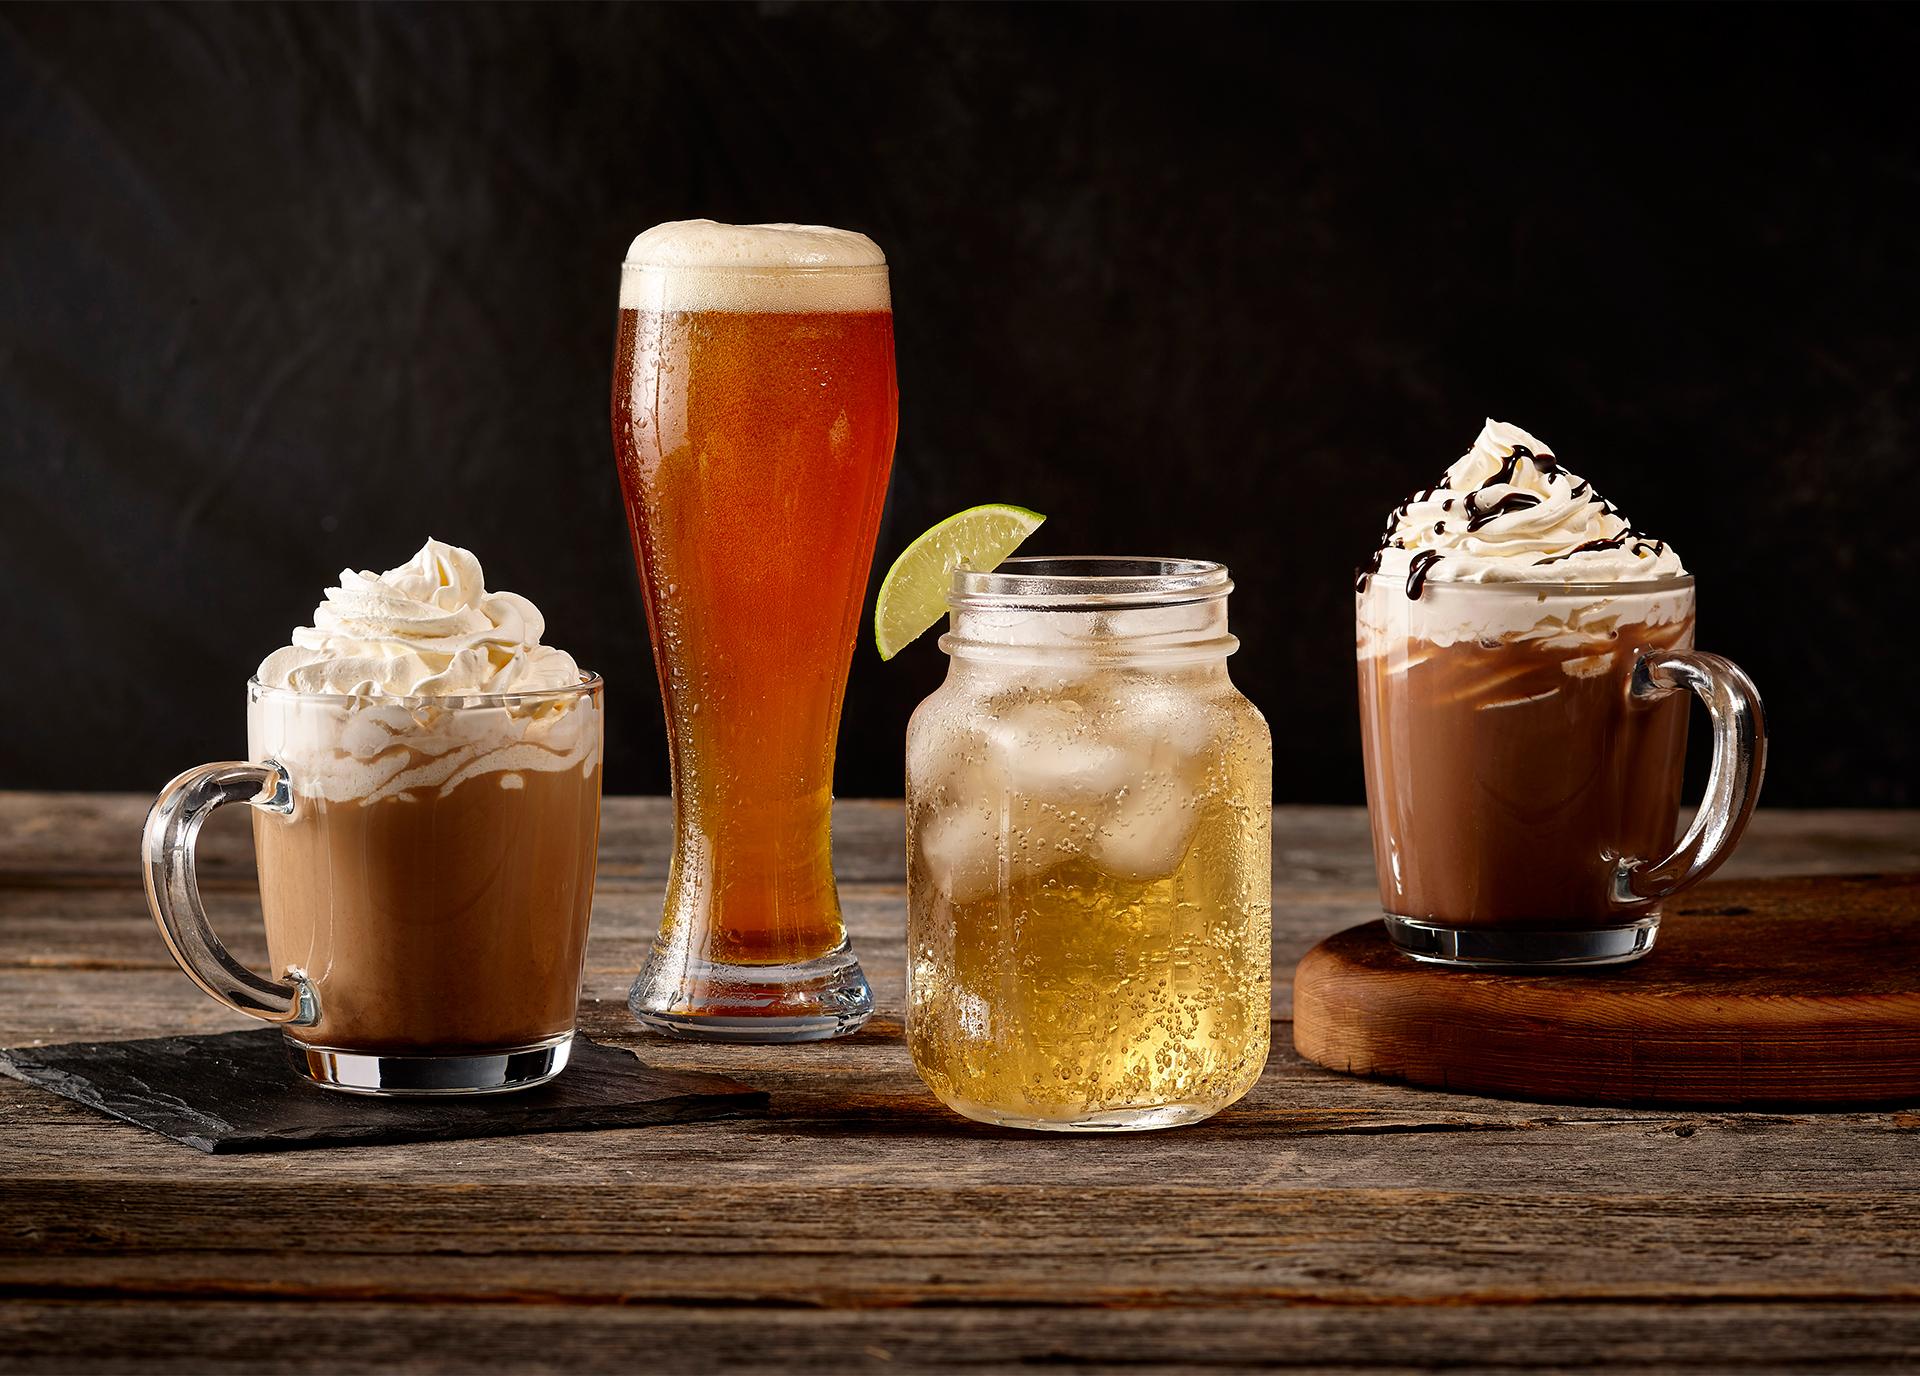 liquor-photographer-alcoholic-drinks-2-tango-photography